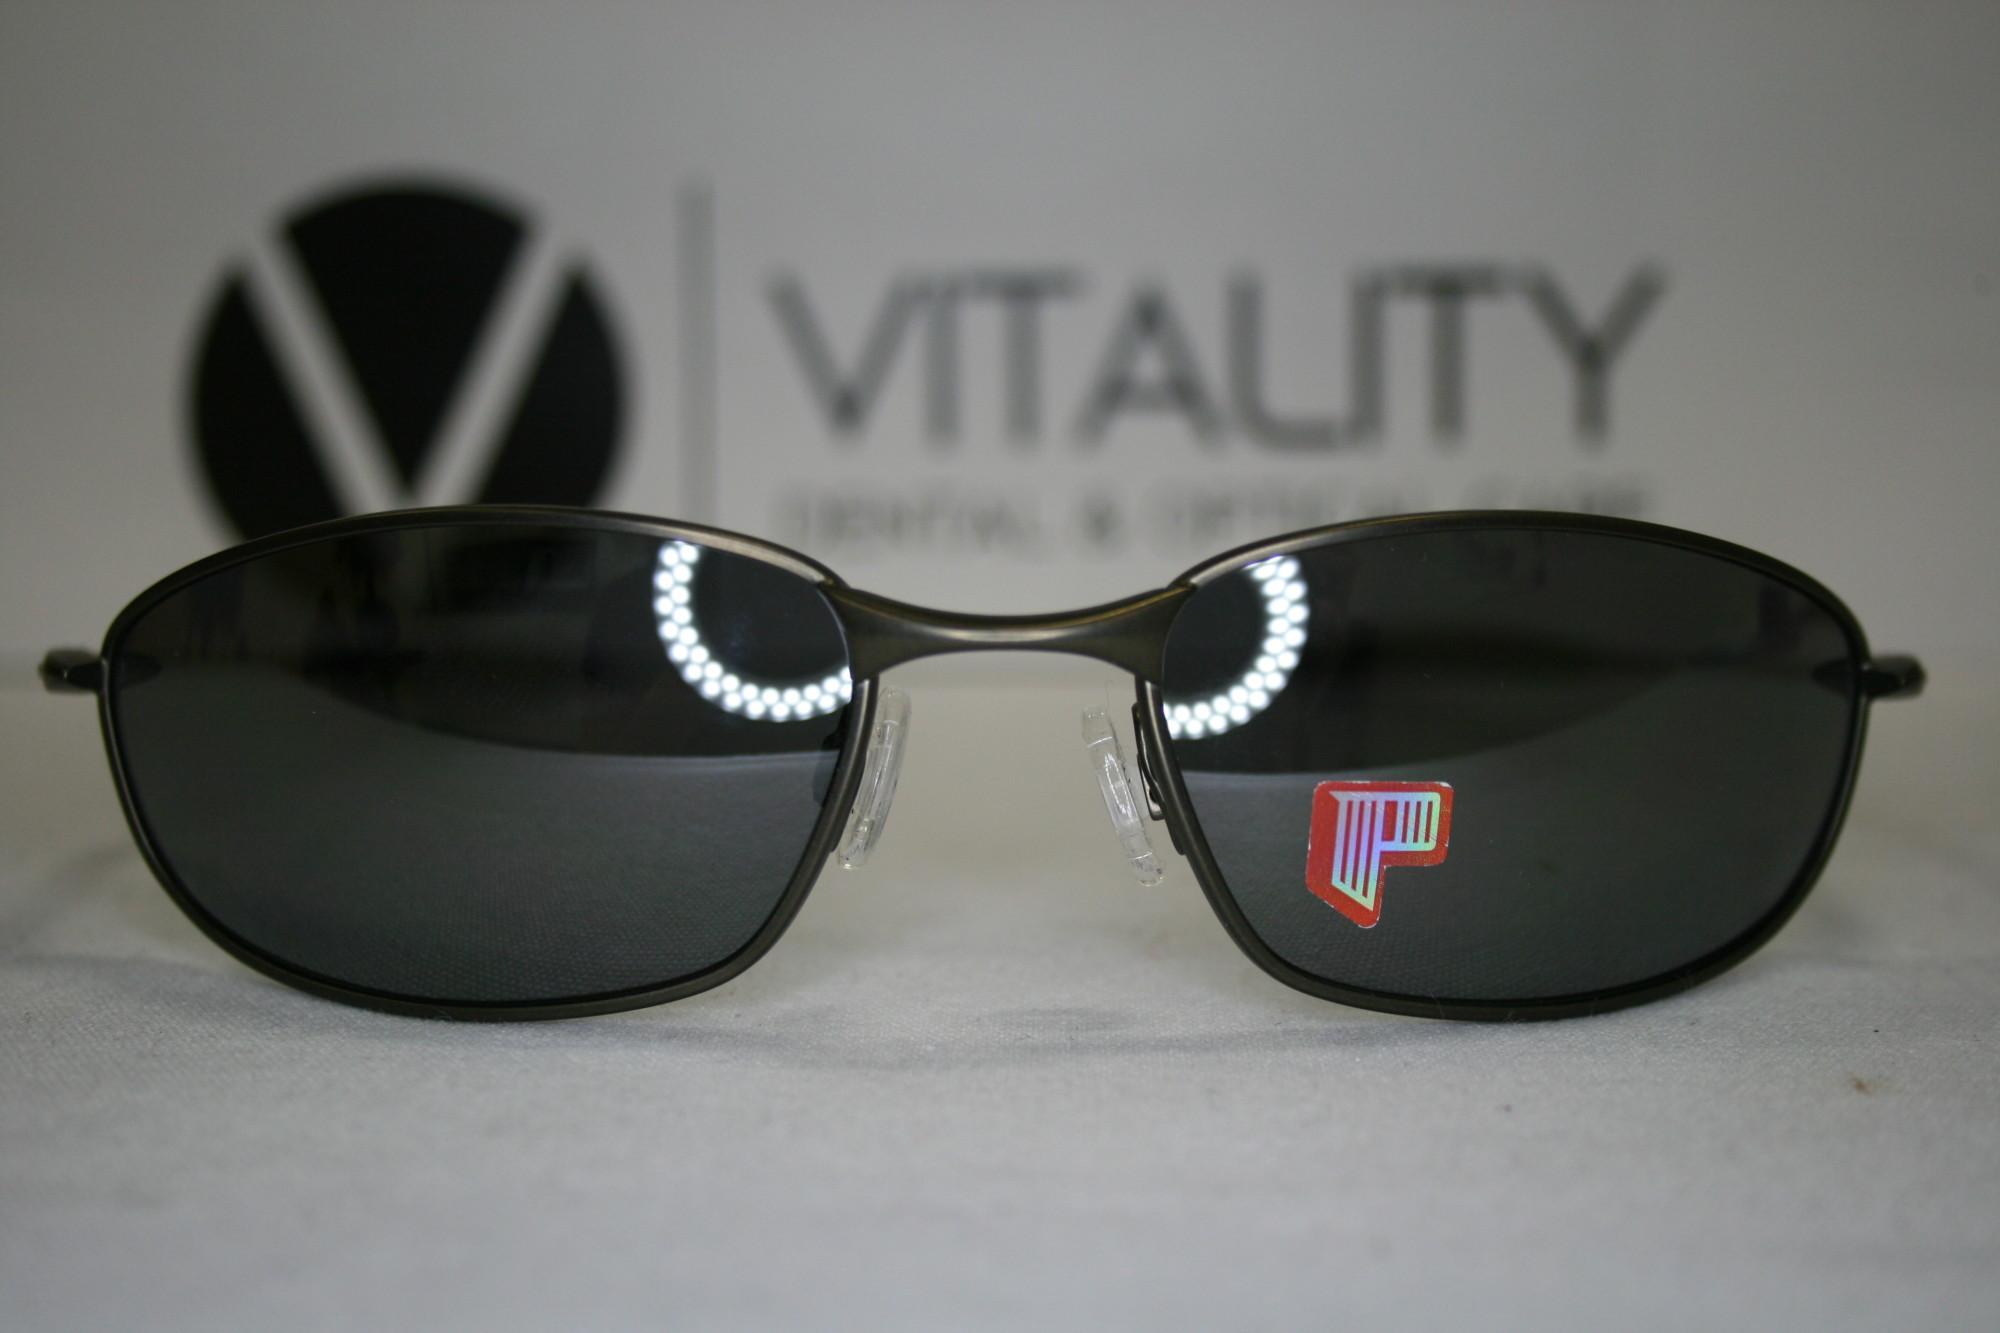 c69bac5148 Strike Back Sunglasses